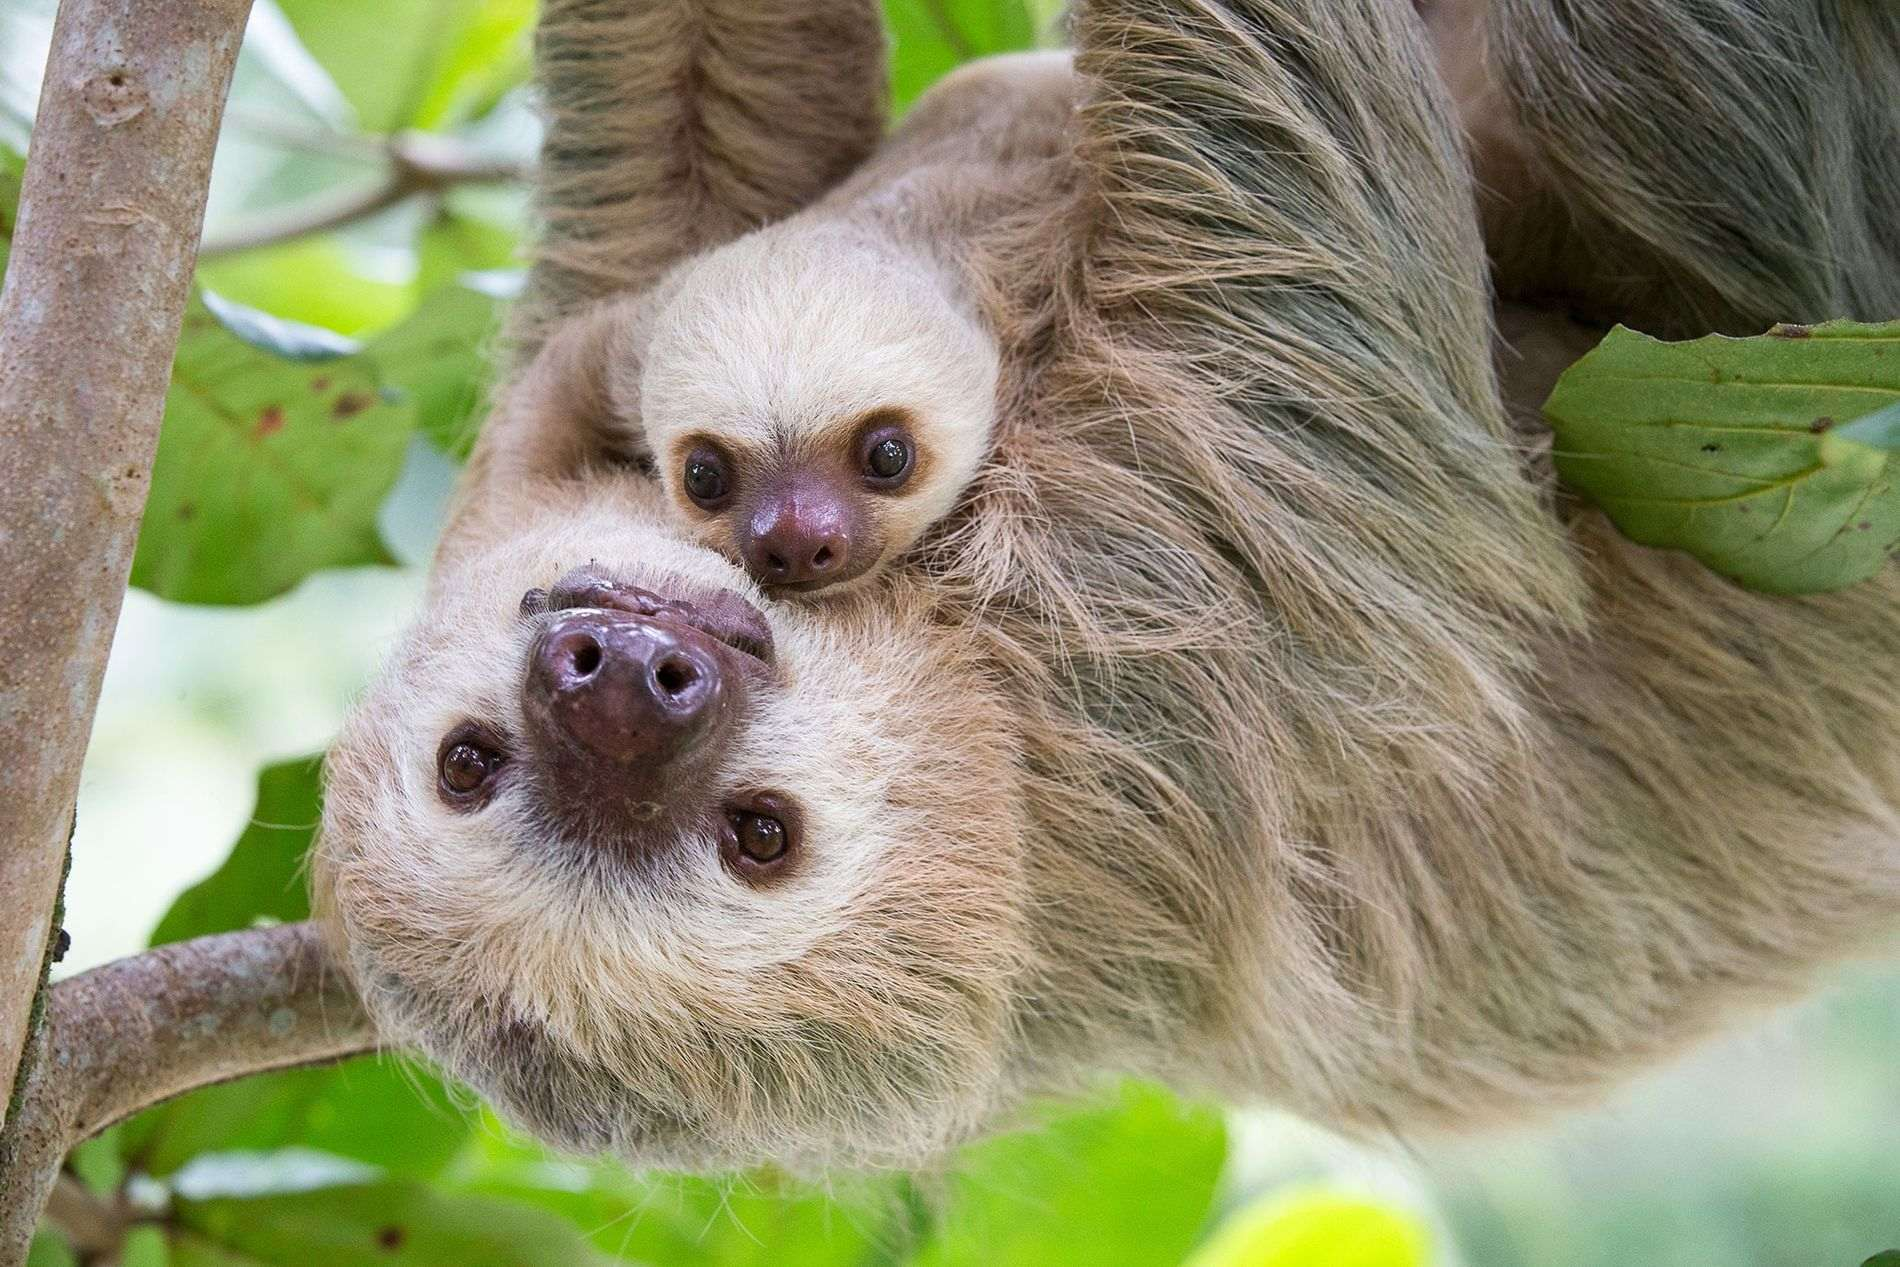 01-cute-sloths-sloth_tw_034450_fullcolor-1.jpg